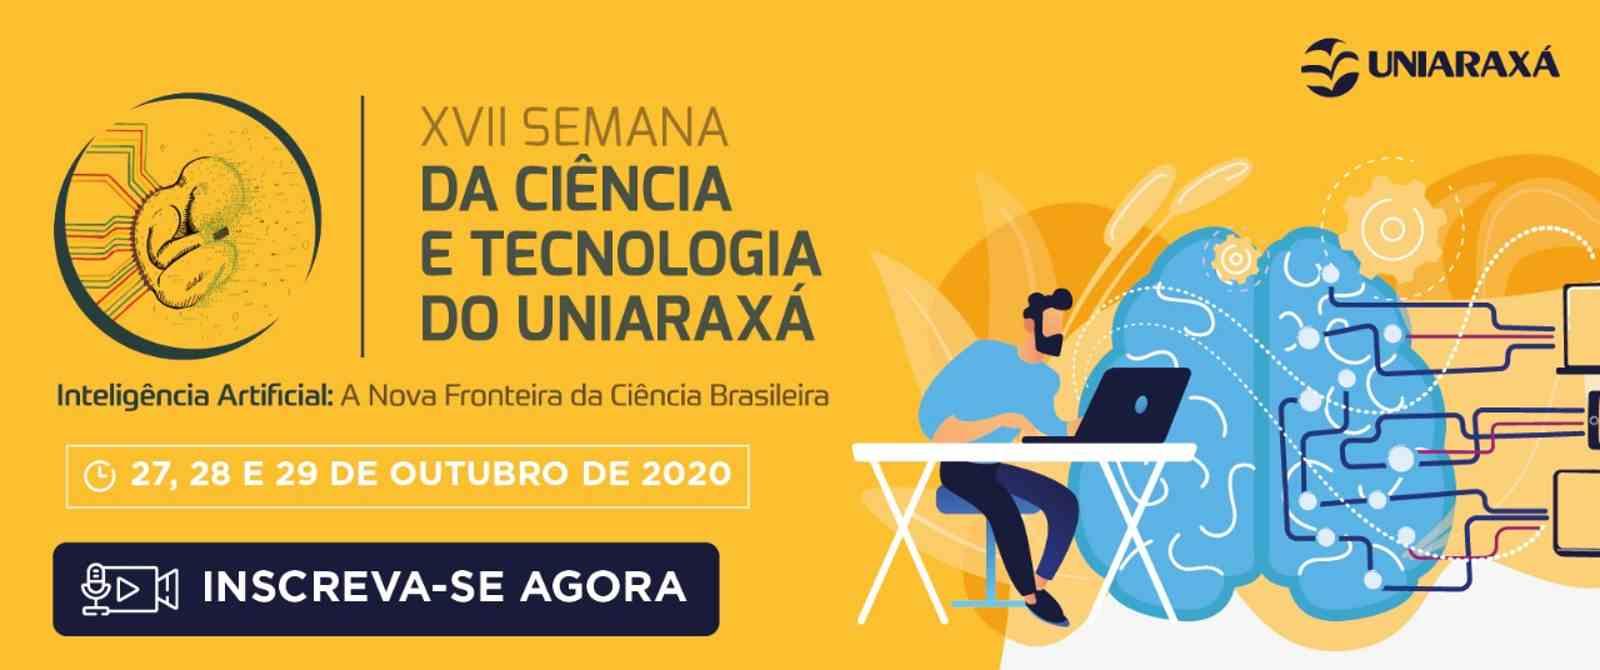 XVII Semana da Ciência e Tecnologia UNIARAXÁ